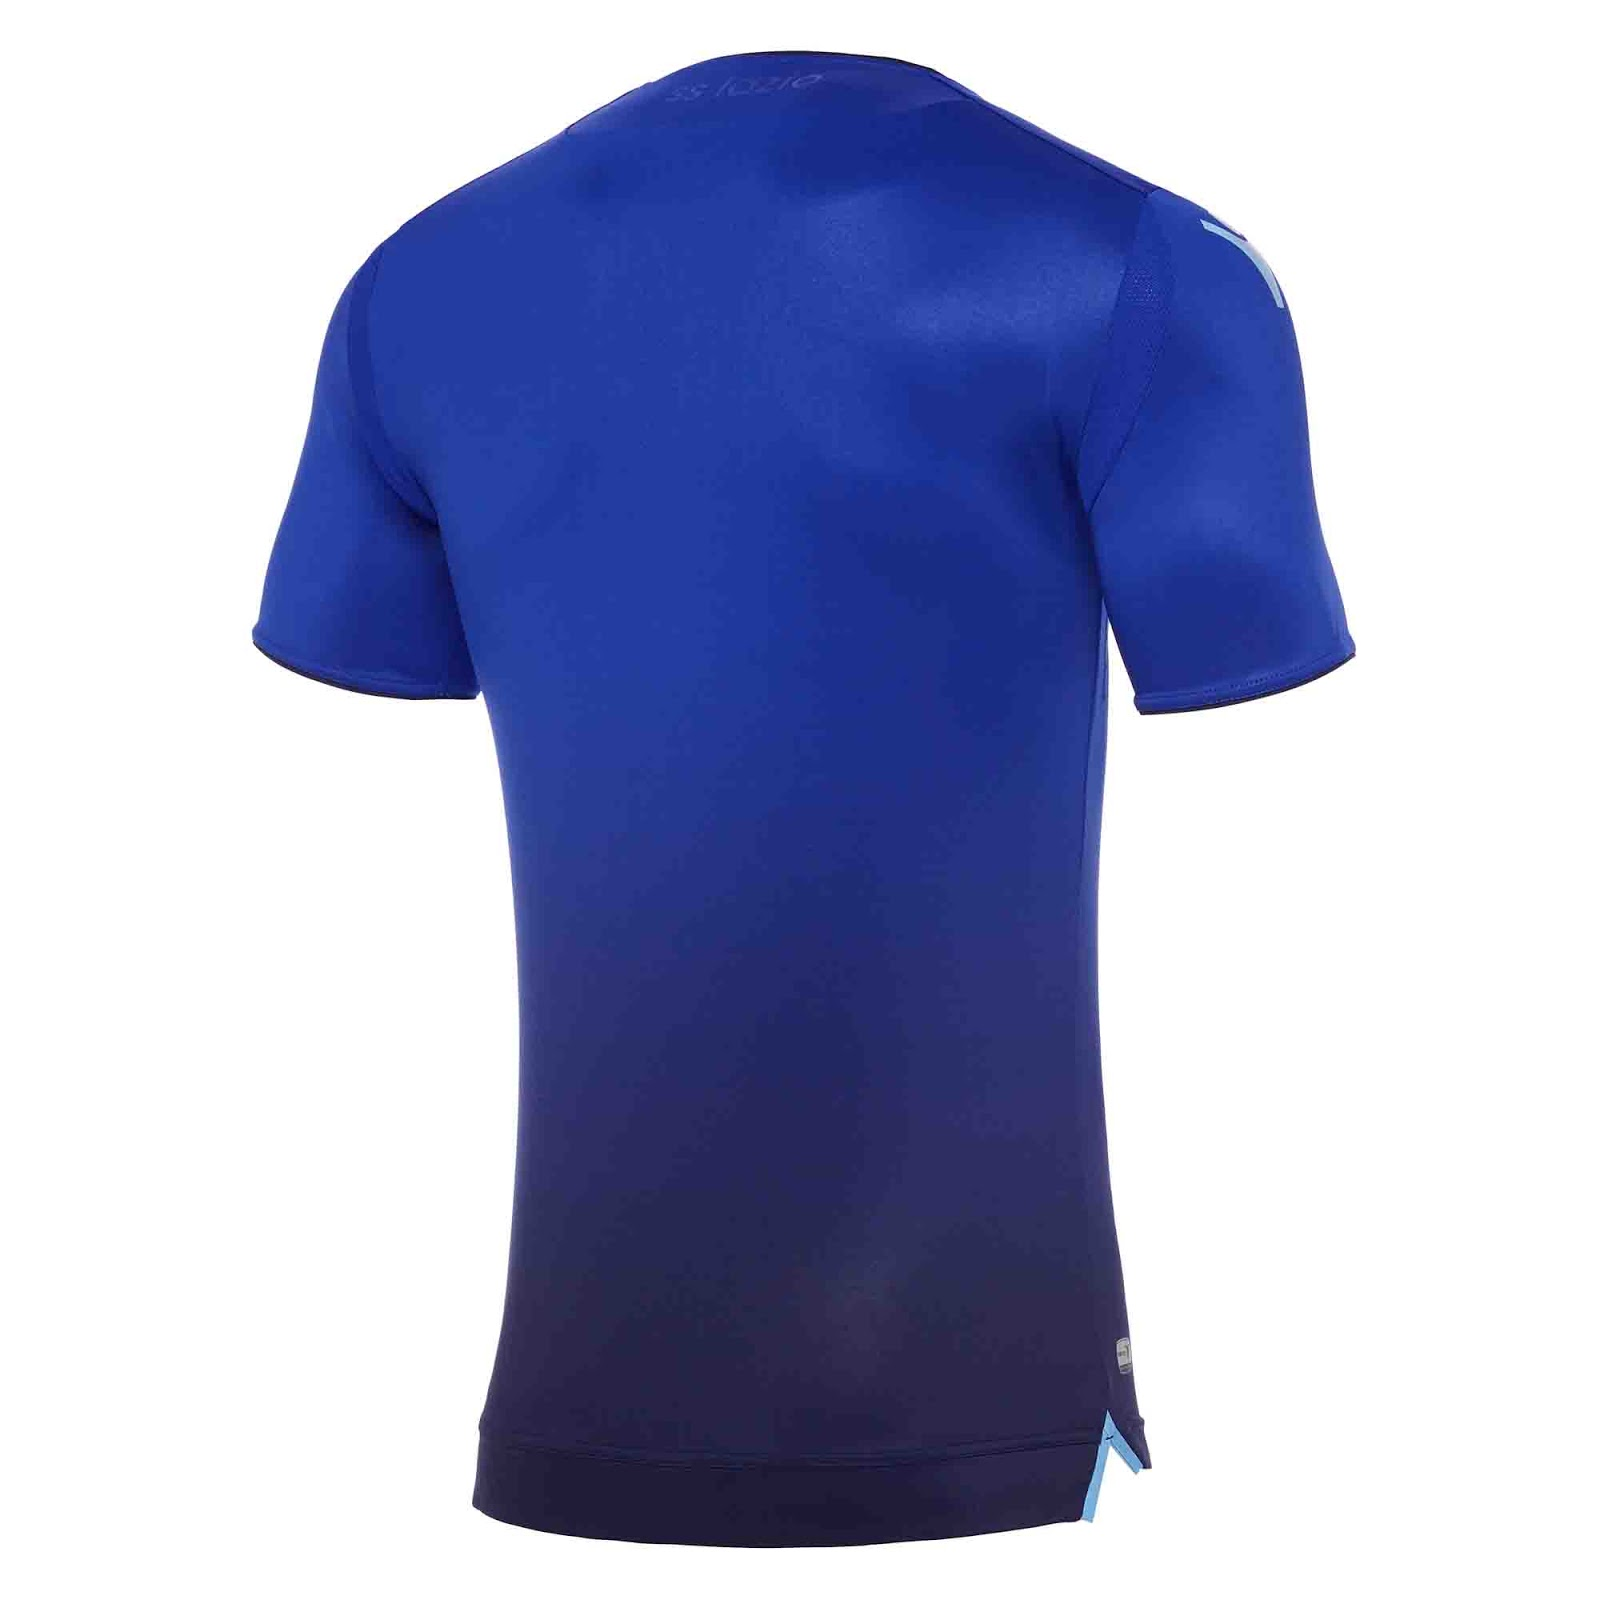 Buy Lazio 17 18 Home, Third & Europa League Kits Released